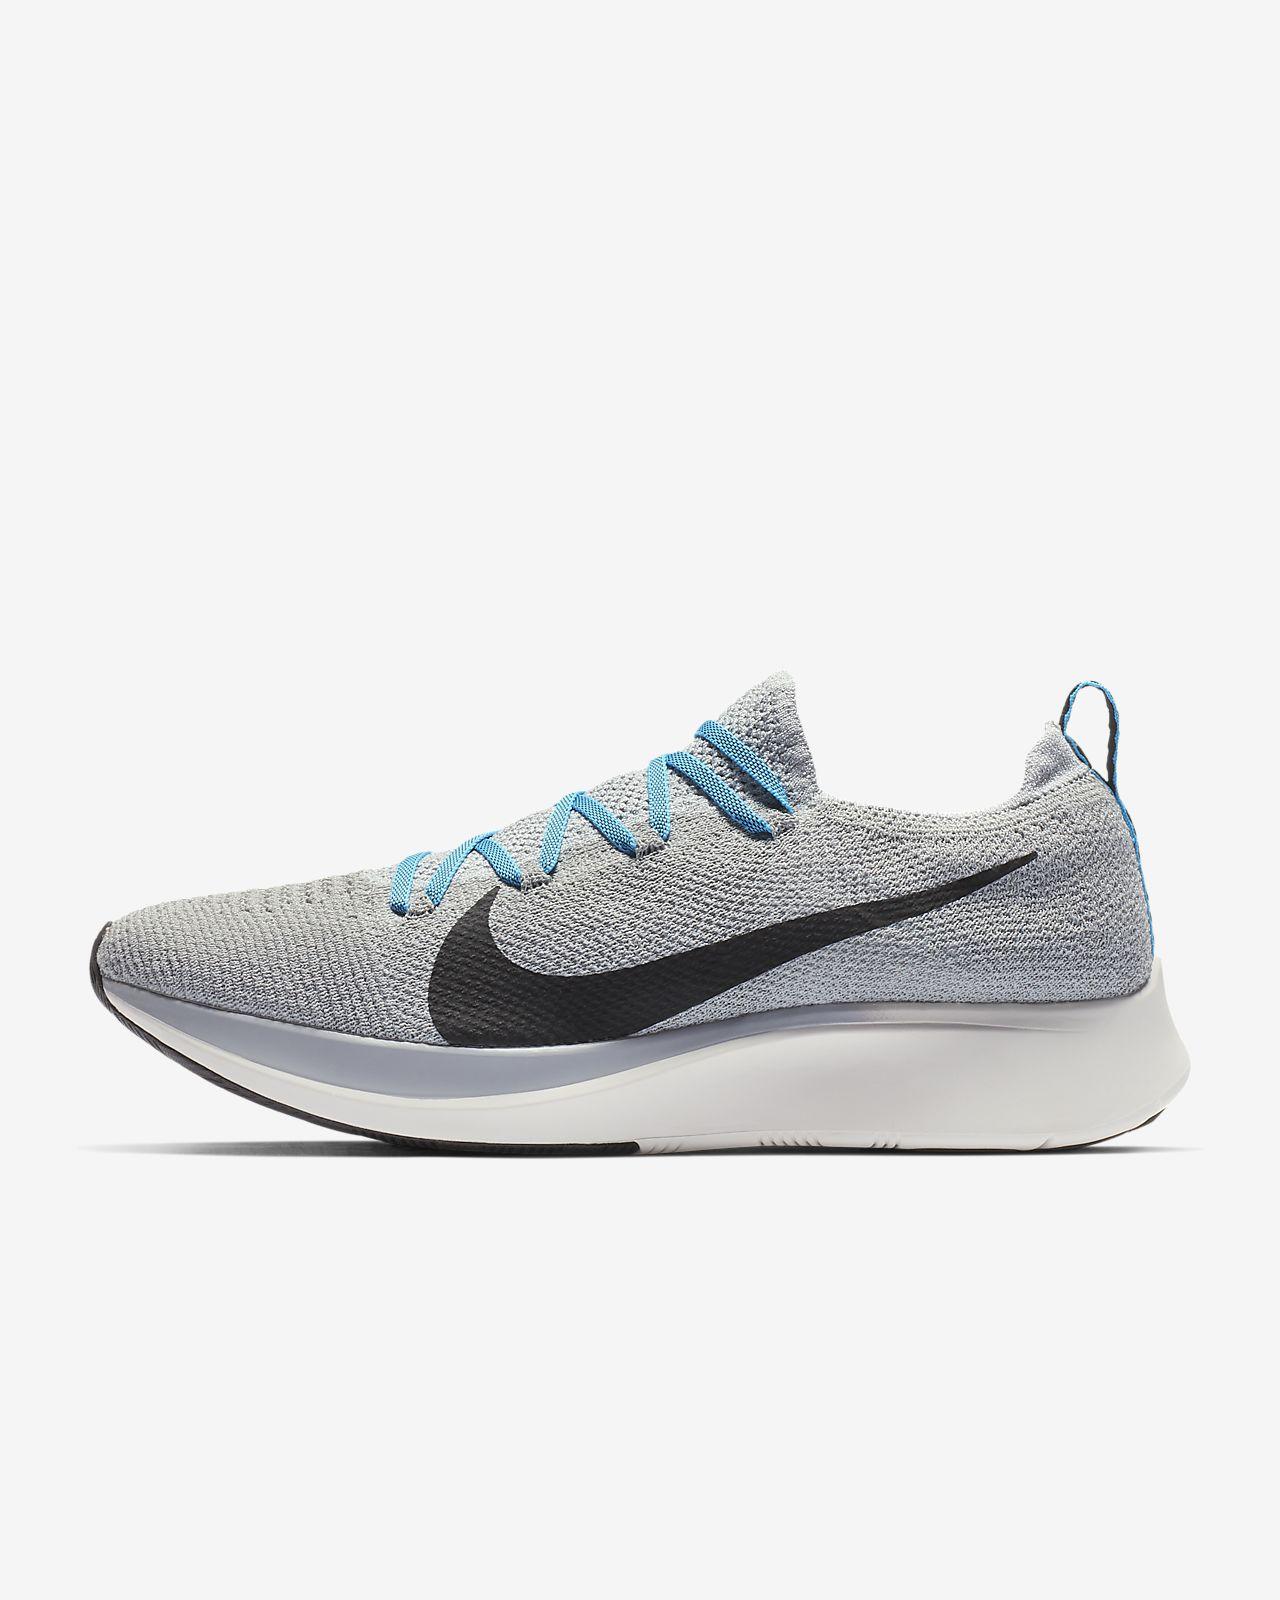 e493cb08636 Nike Zoom Fly Flyknit Men s Running Shoe. Nike.com